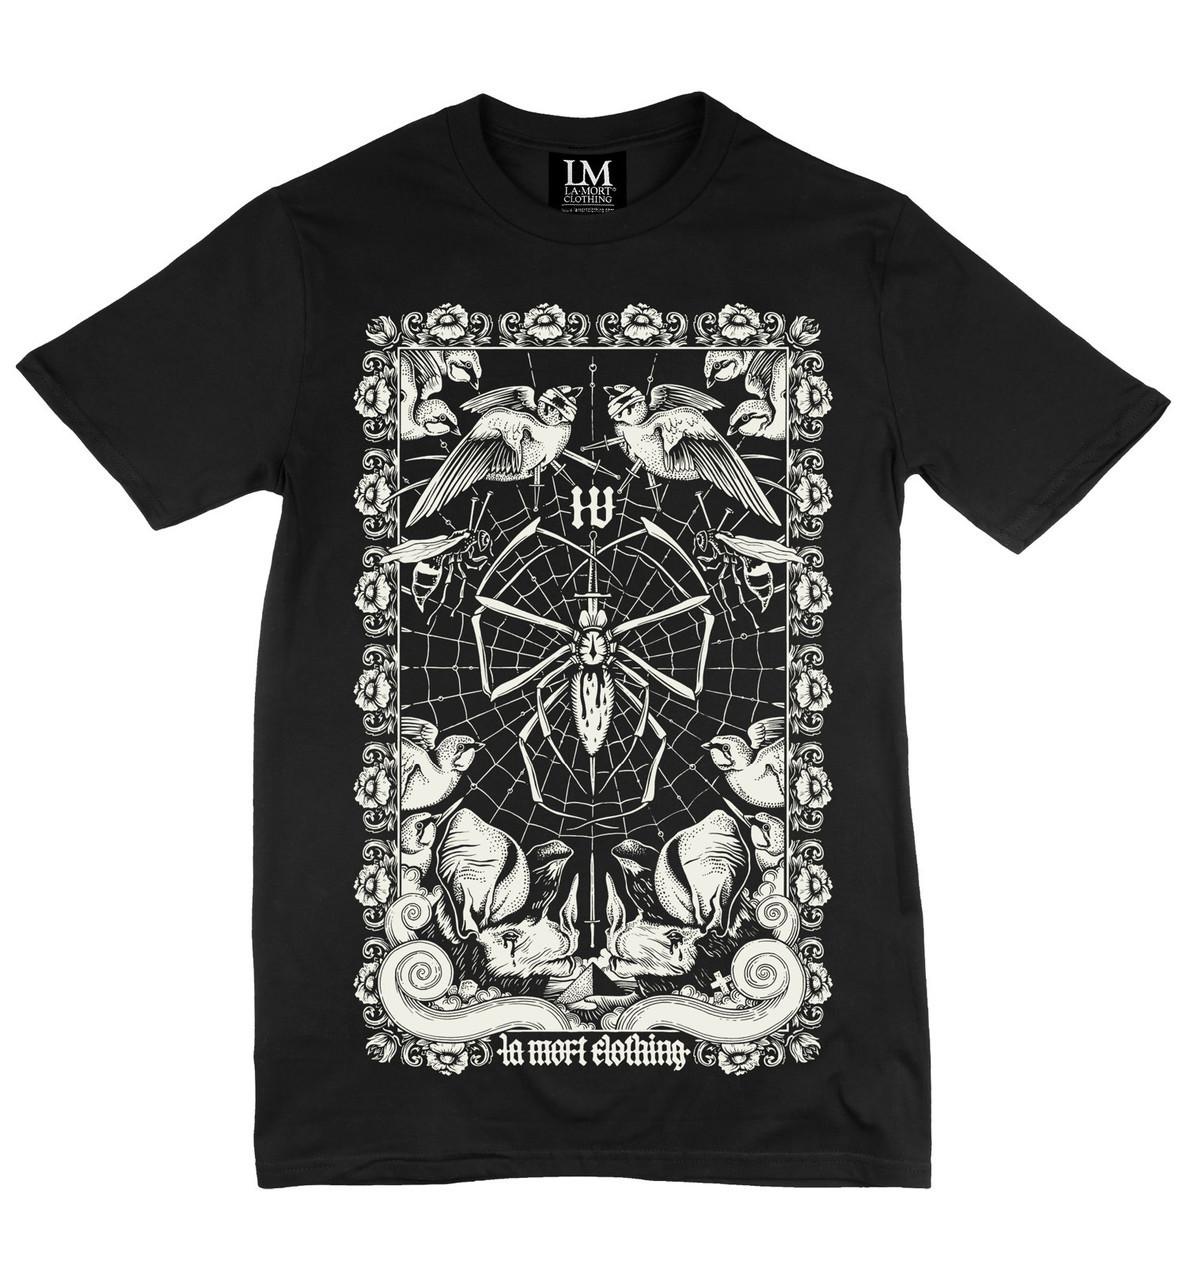 ropa tattoo diseño muerta imagenes tatuaje ropa online tienda 13depicas